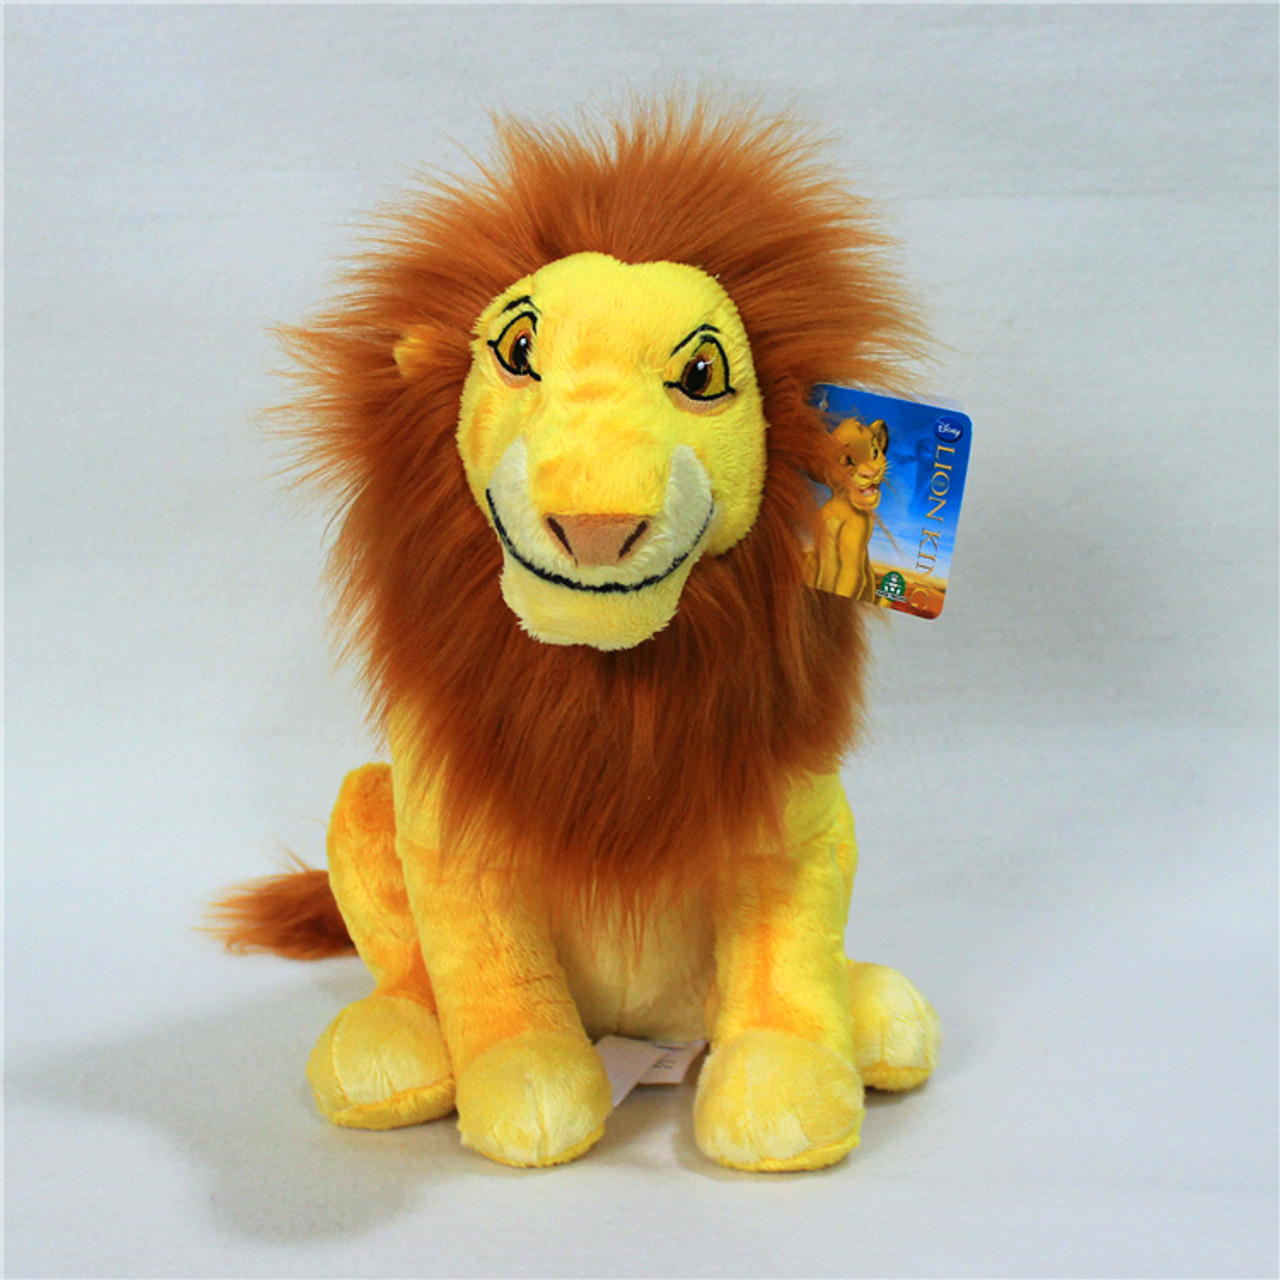 New Style Simba The Lion King Plush Toys 35cm Stuffed Animal Doll